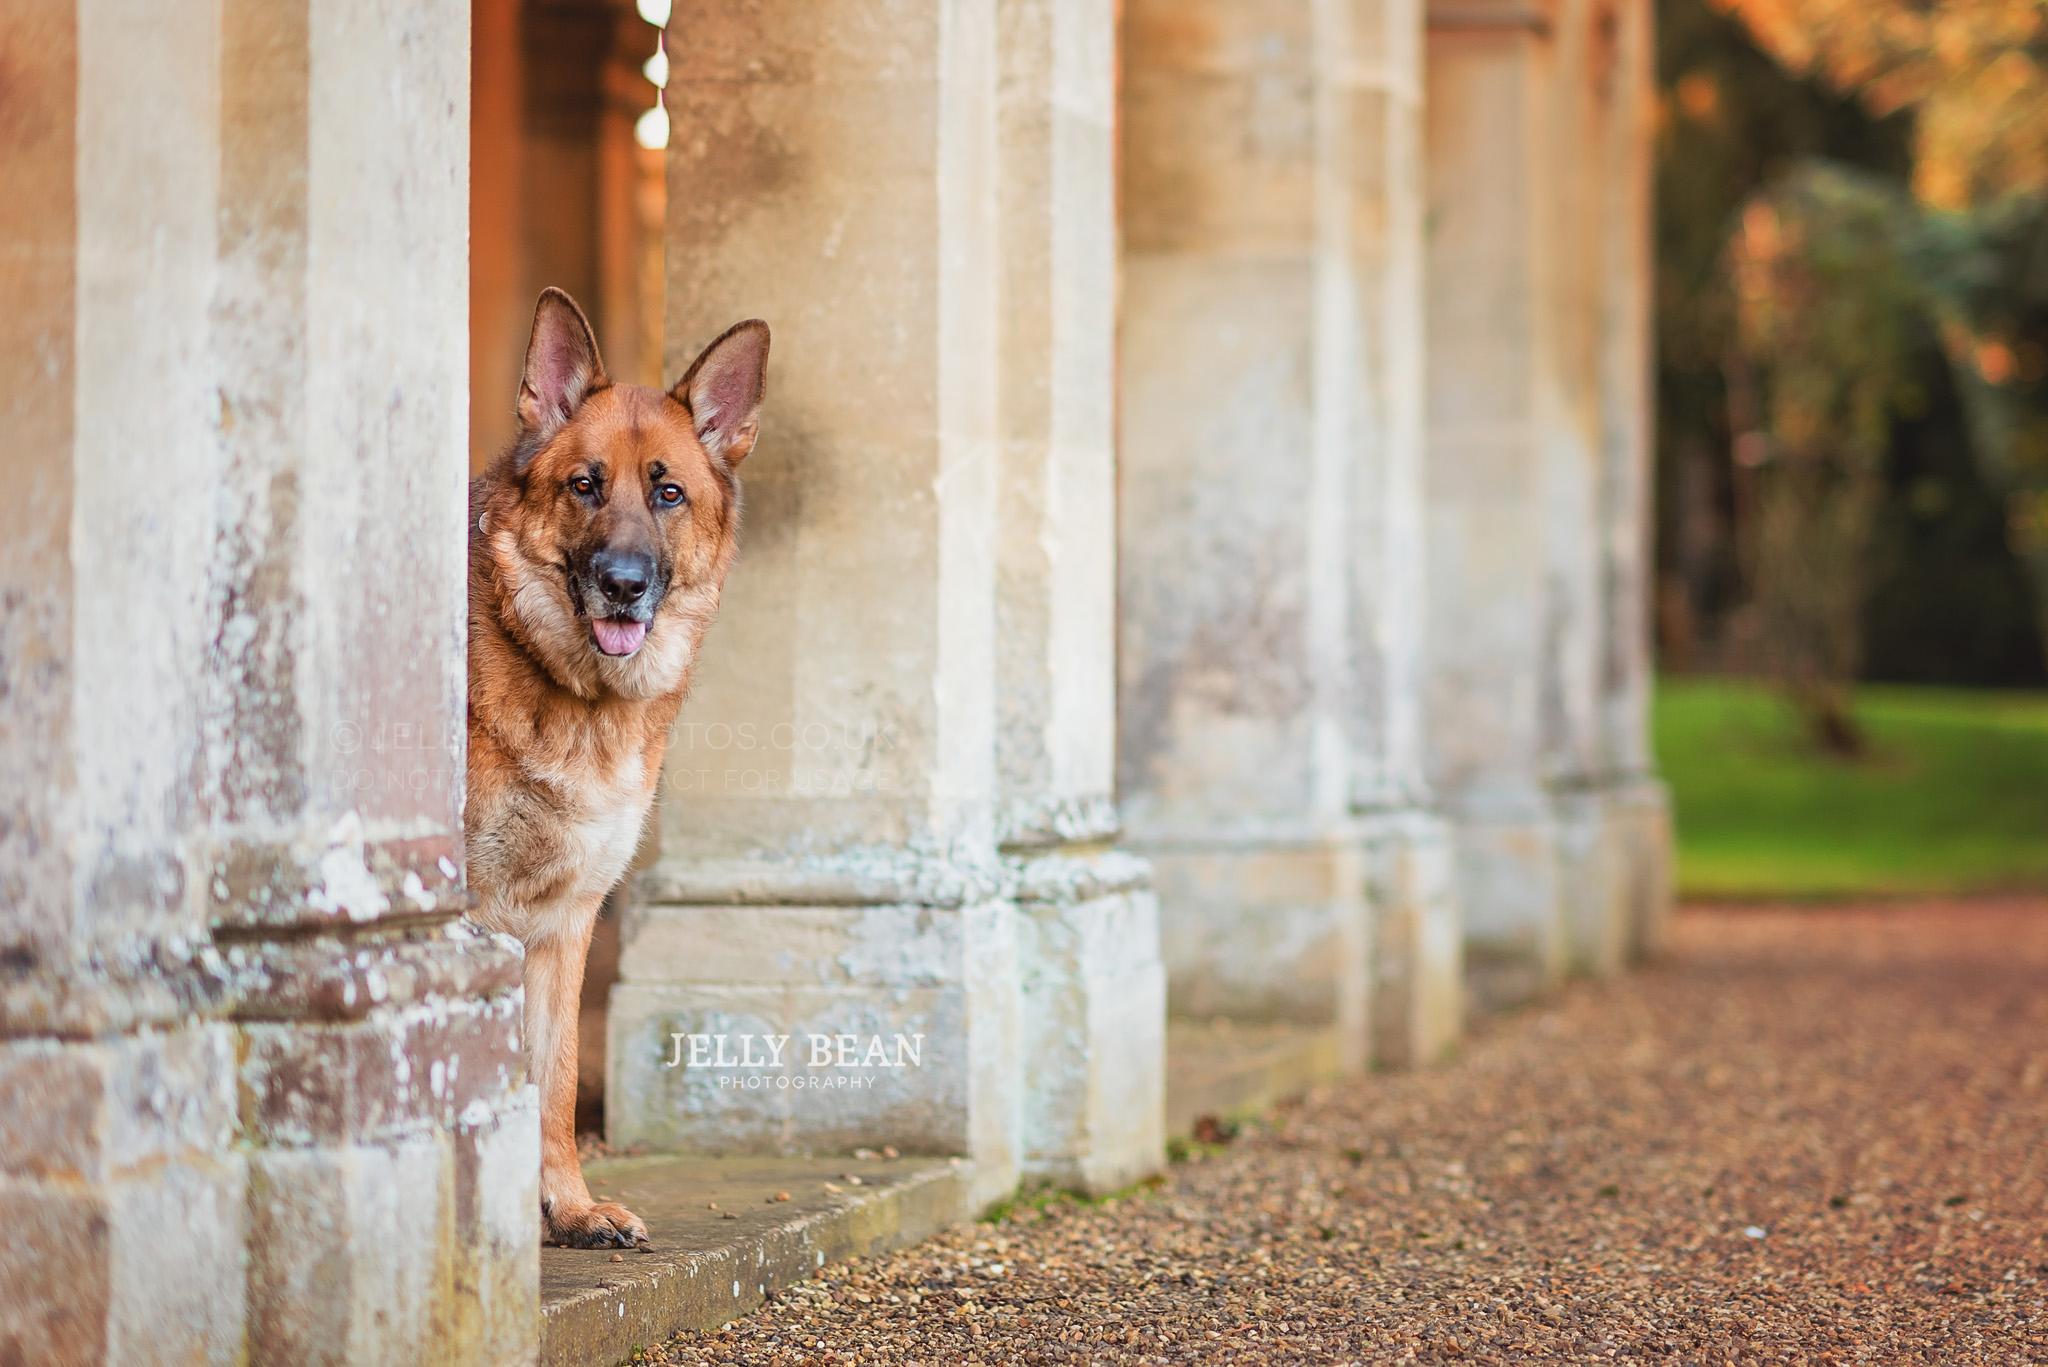 German shepherd dog standing among pillars